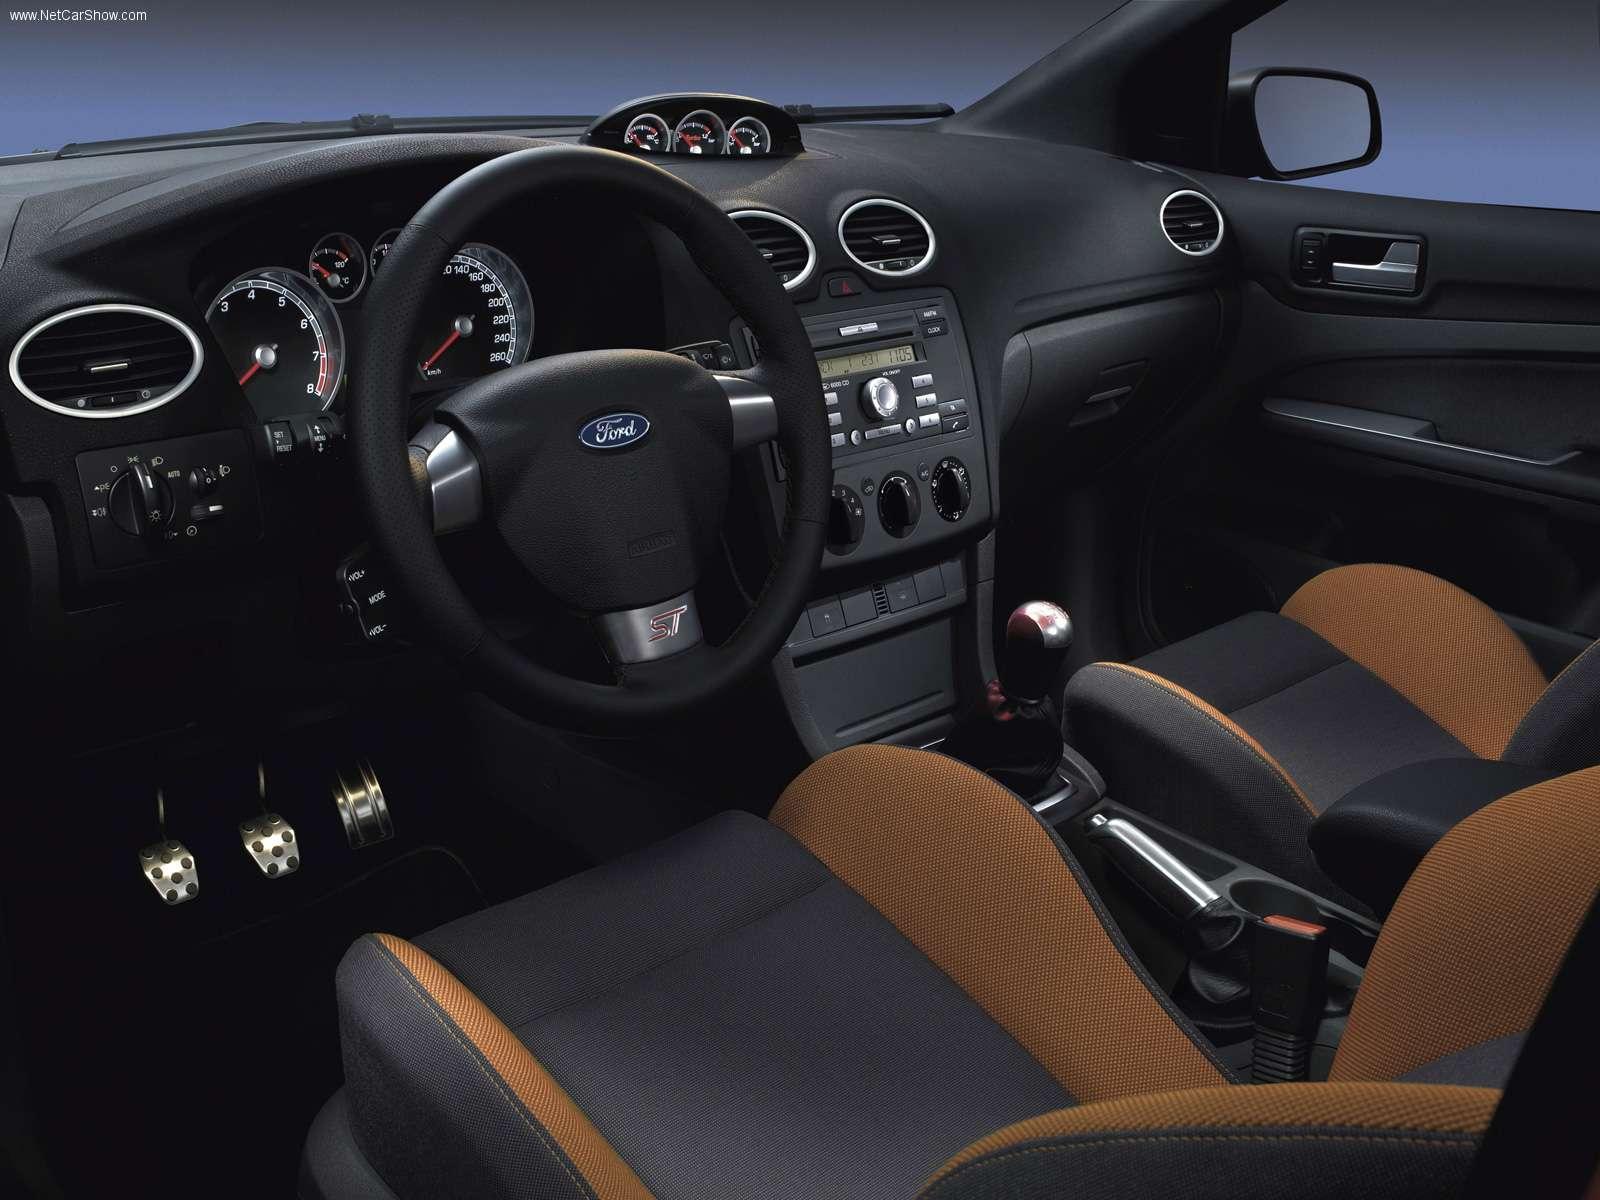 ford focus st 3 door hatchback 2007